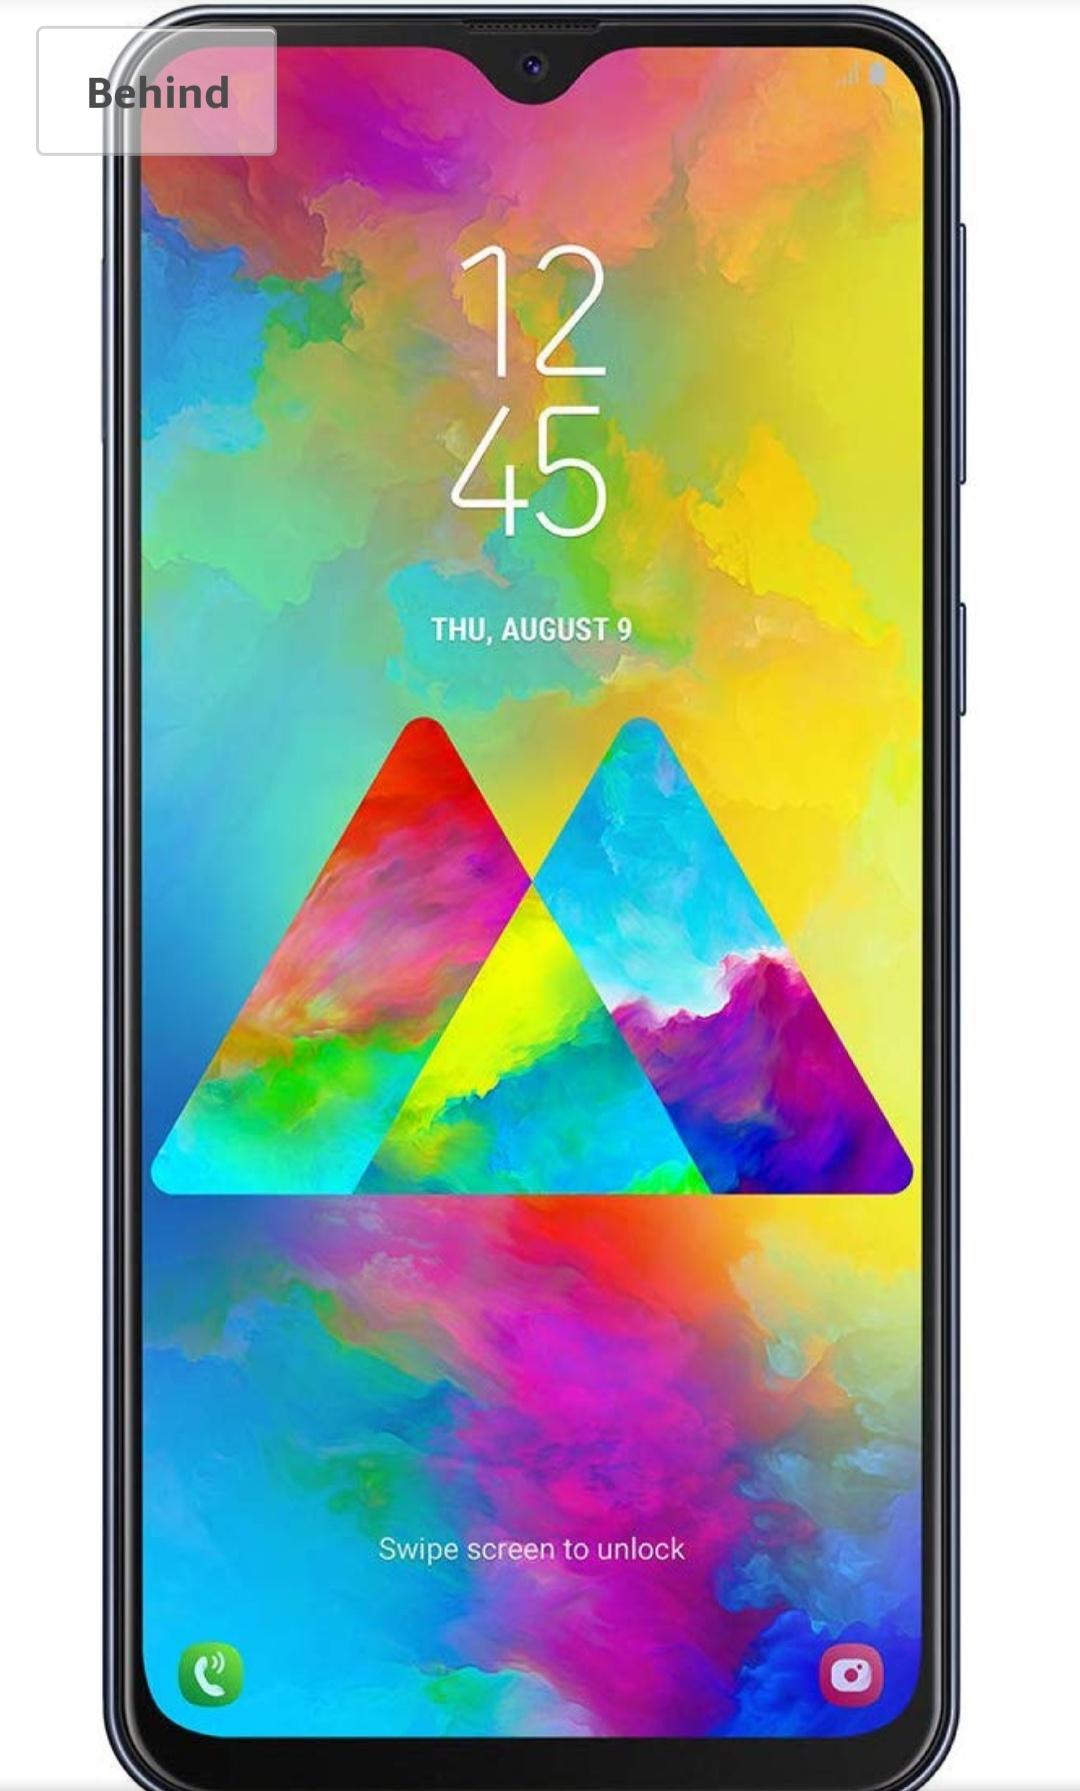 "Samsung Galaxy M20 Smartphone, FHD + Infinity V Display 6.3 "" 4GB RAM, 64GB ROM, Black/Blue £203 w/Fee Free - £208.48 without @ Amazon Spain"